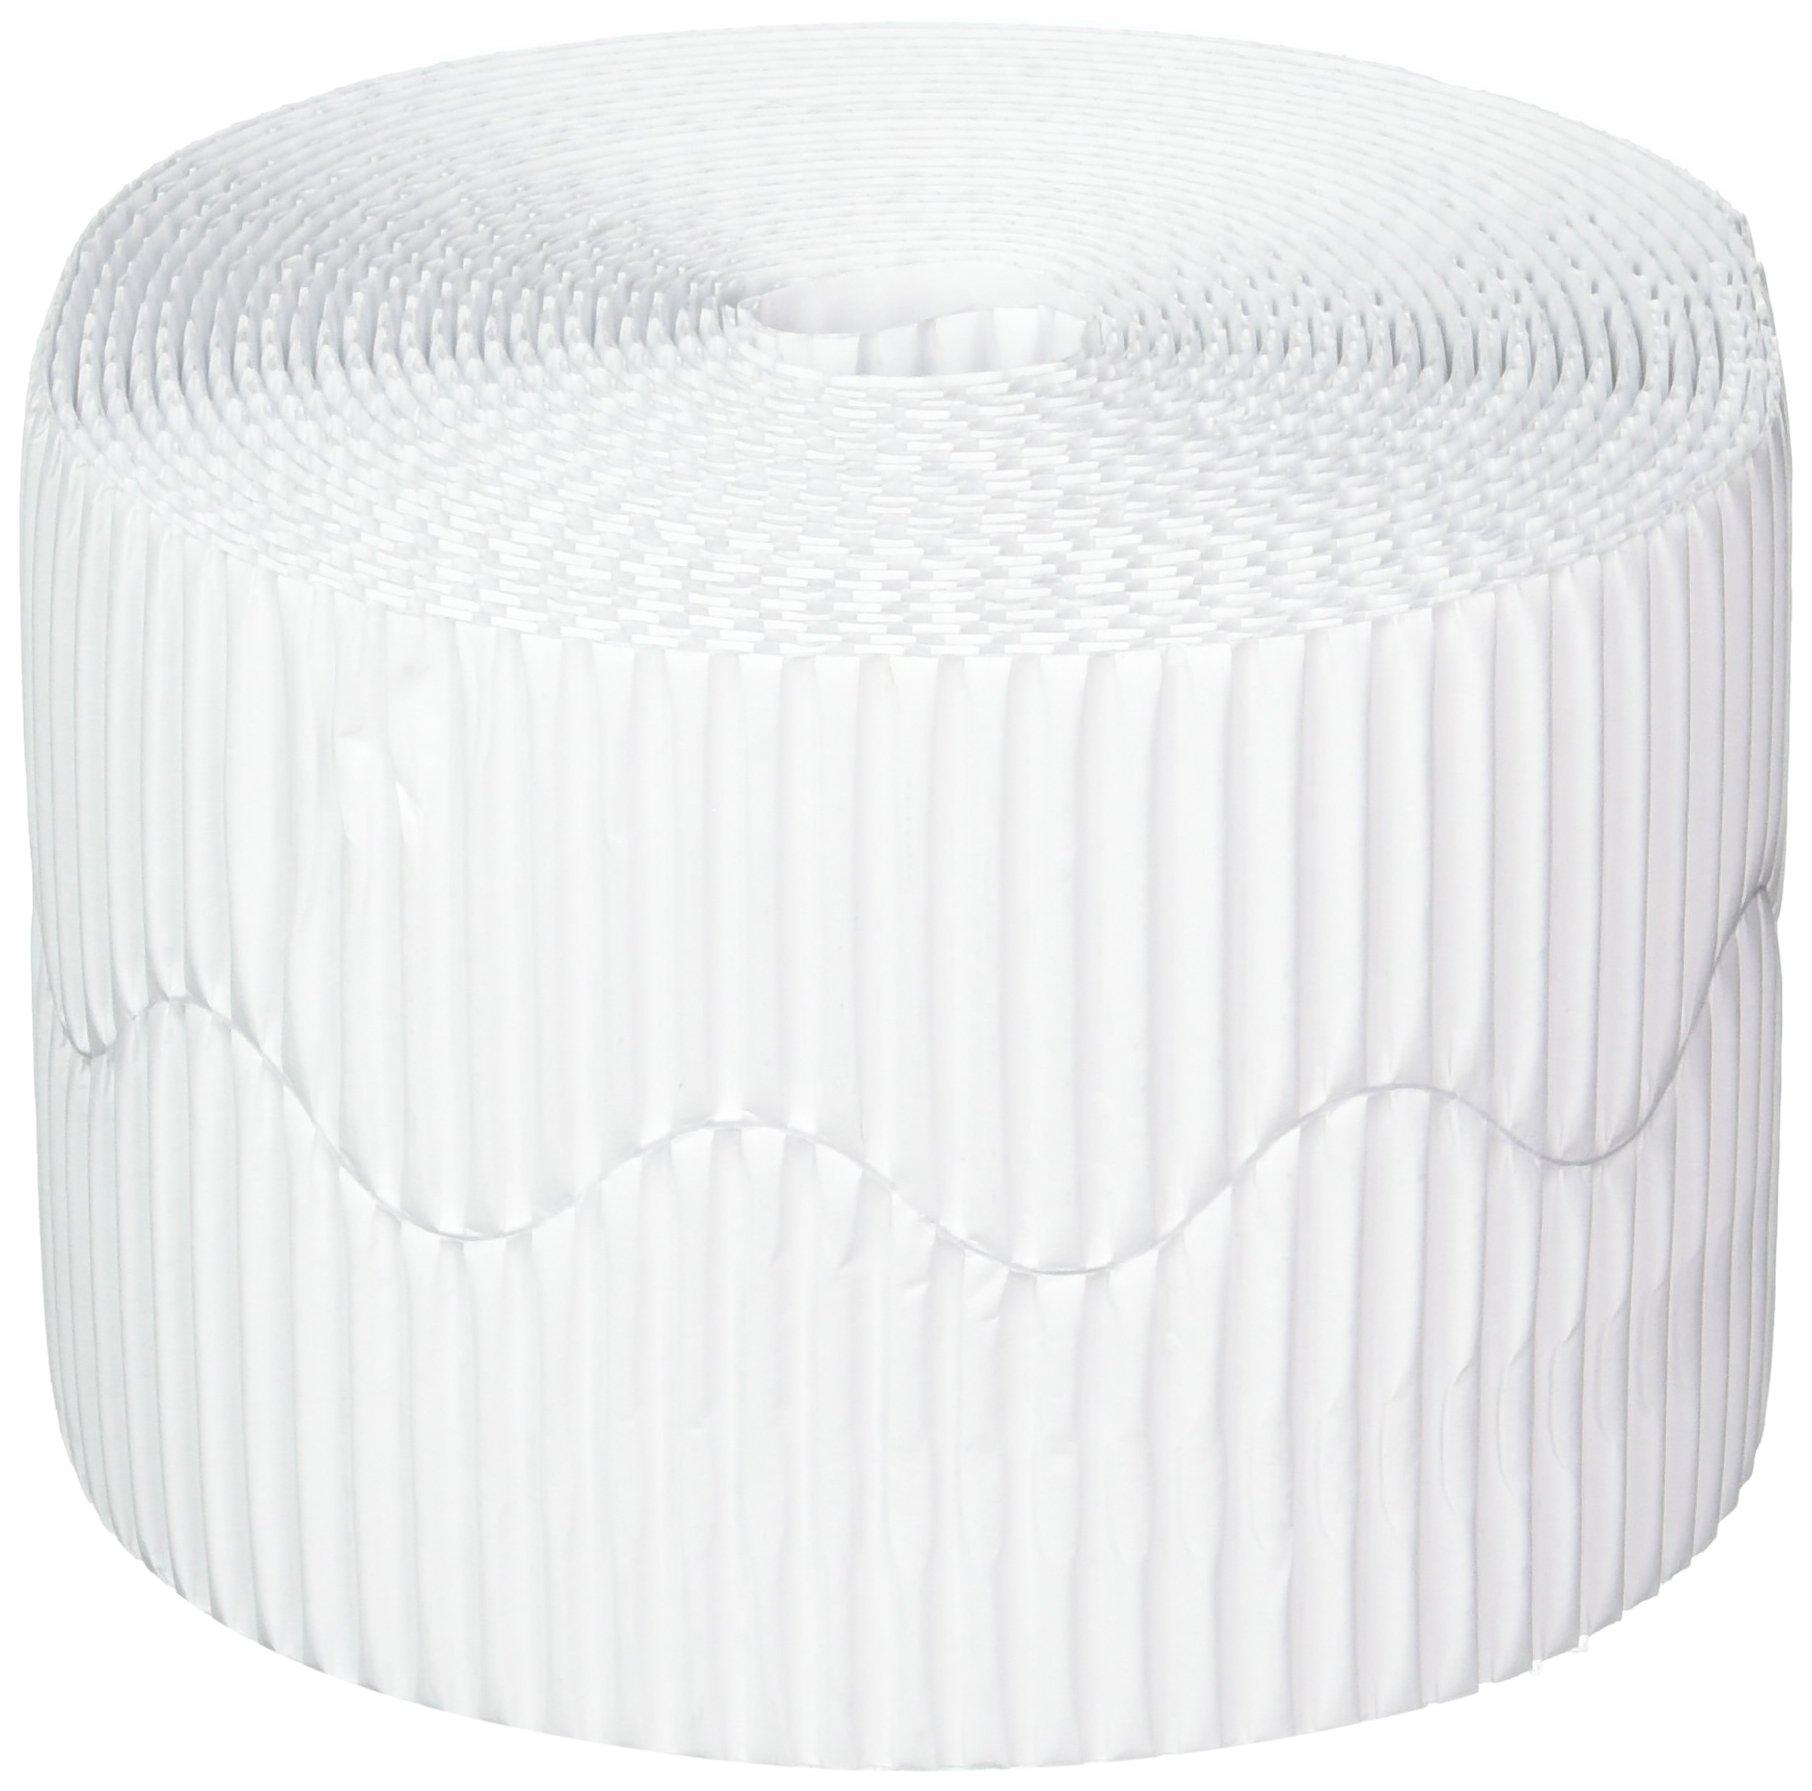 Pacon Bordette Decorative Bulletin Board Border Roll, 2.25'' by 50', White (37014)